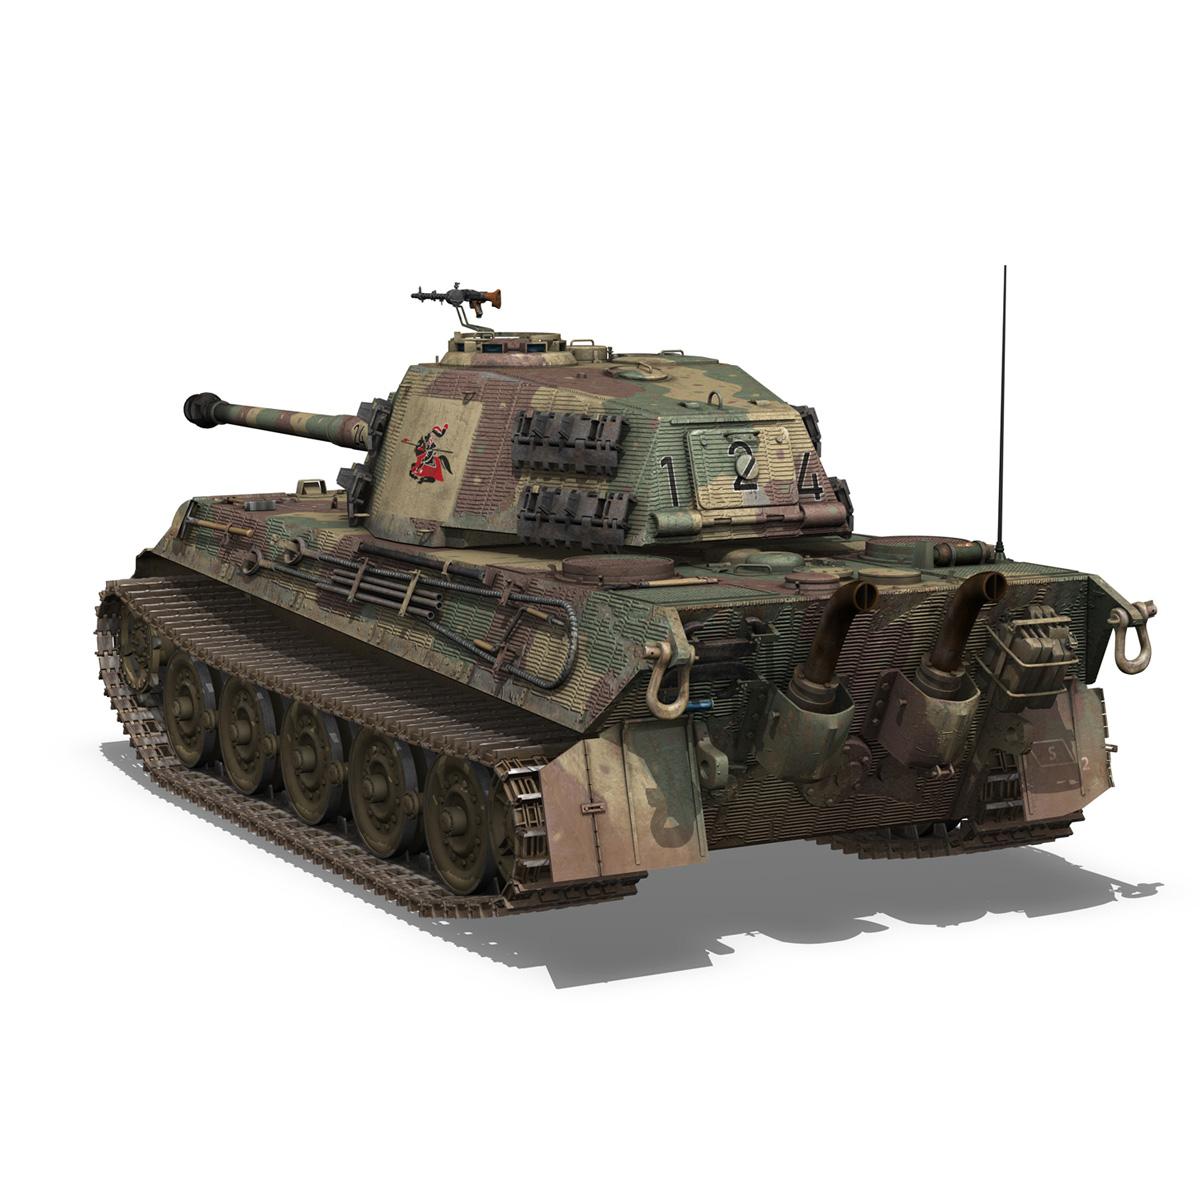 Panzerkampfwagen VI - Ausf B - Tiger II - 124 3d model 3ds c4d lwo lws lw obj 273757